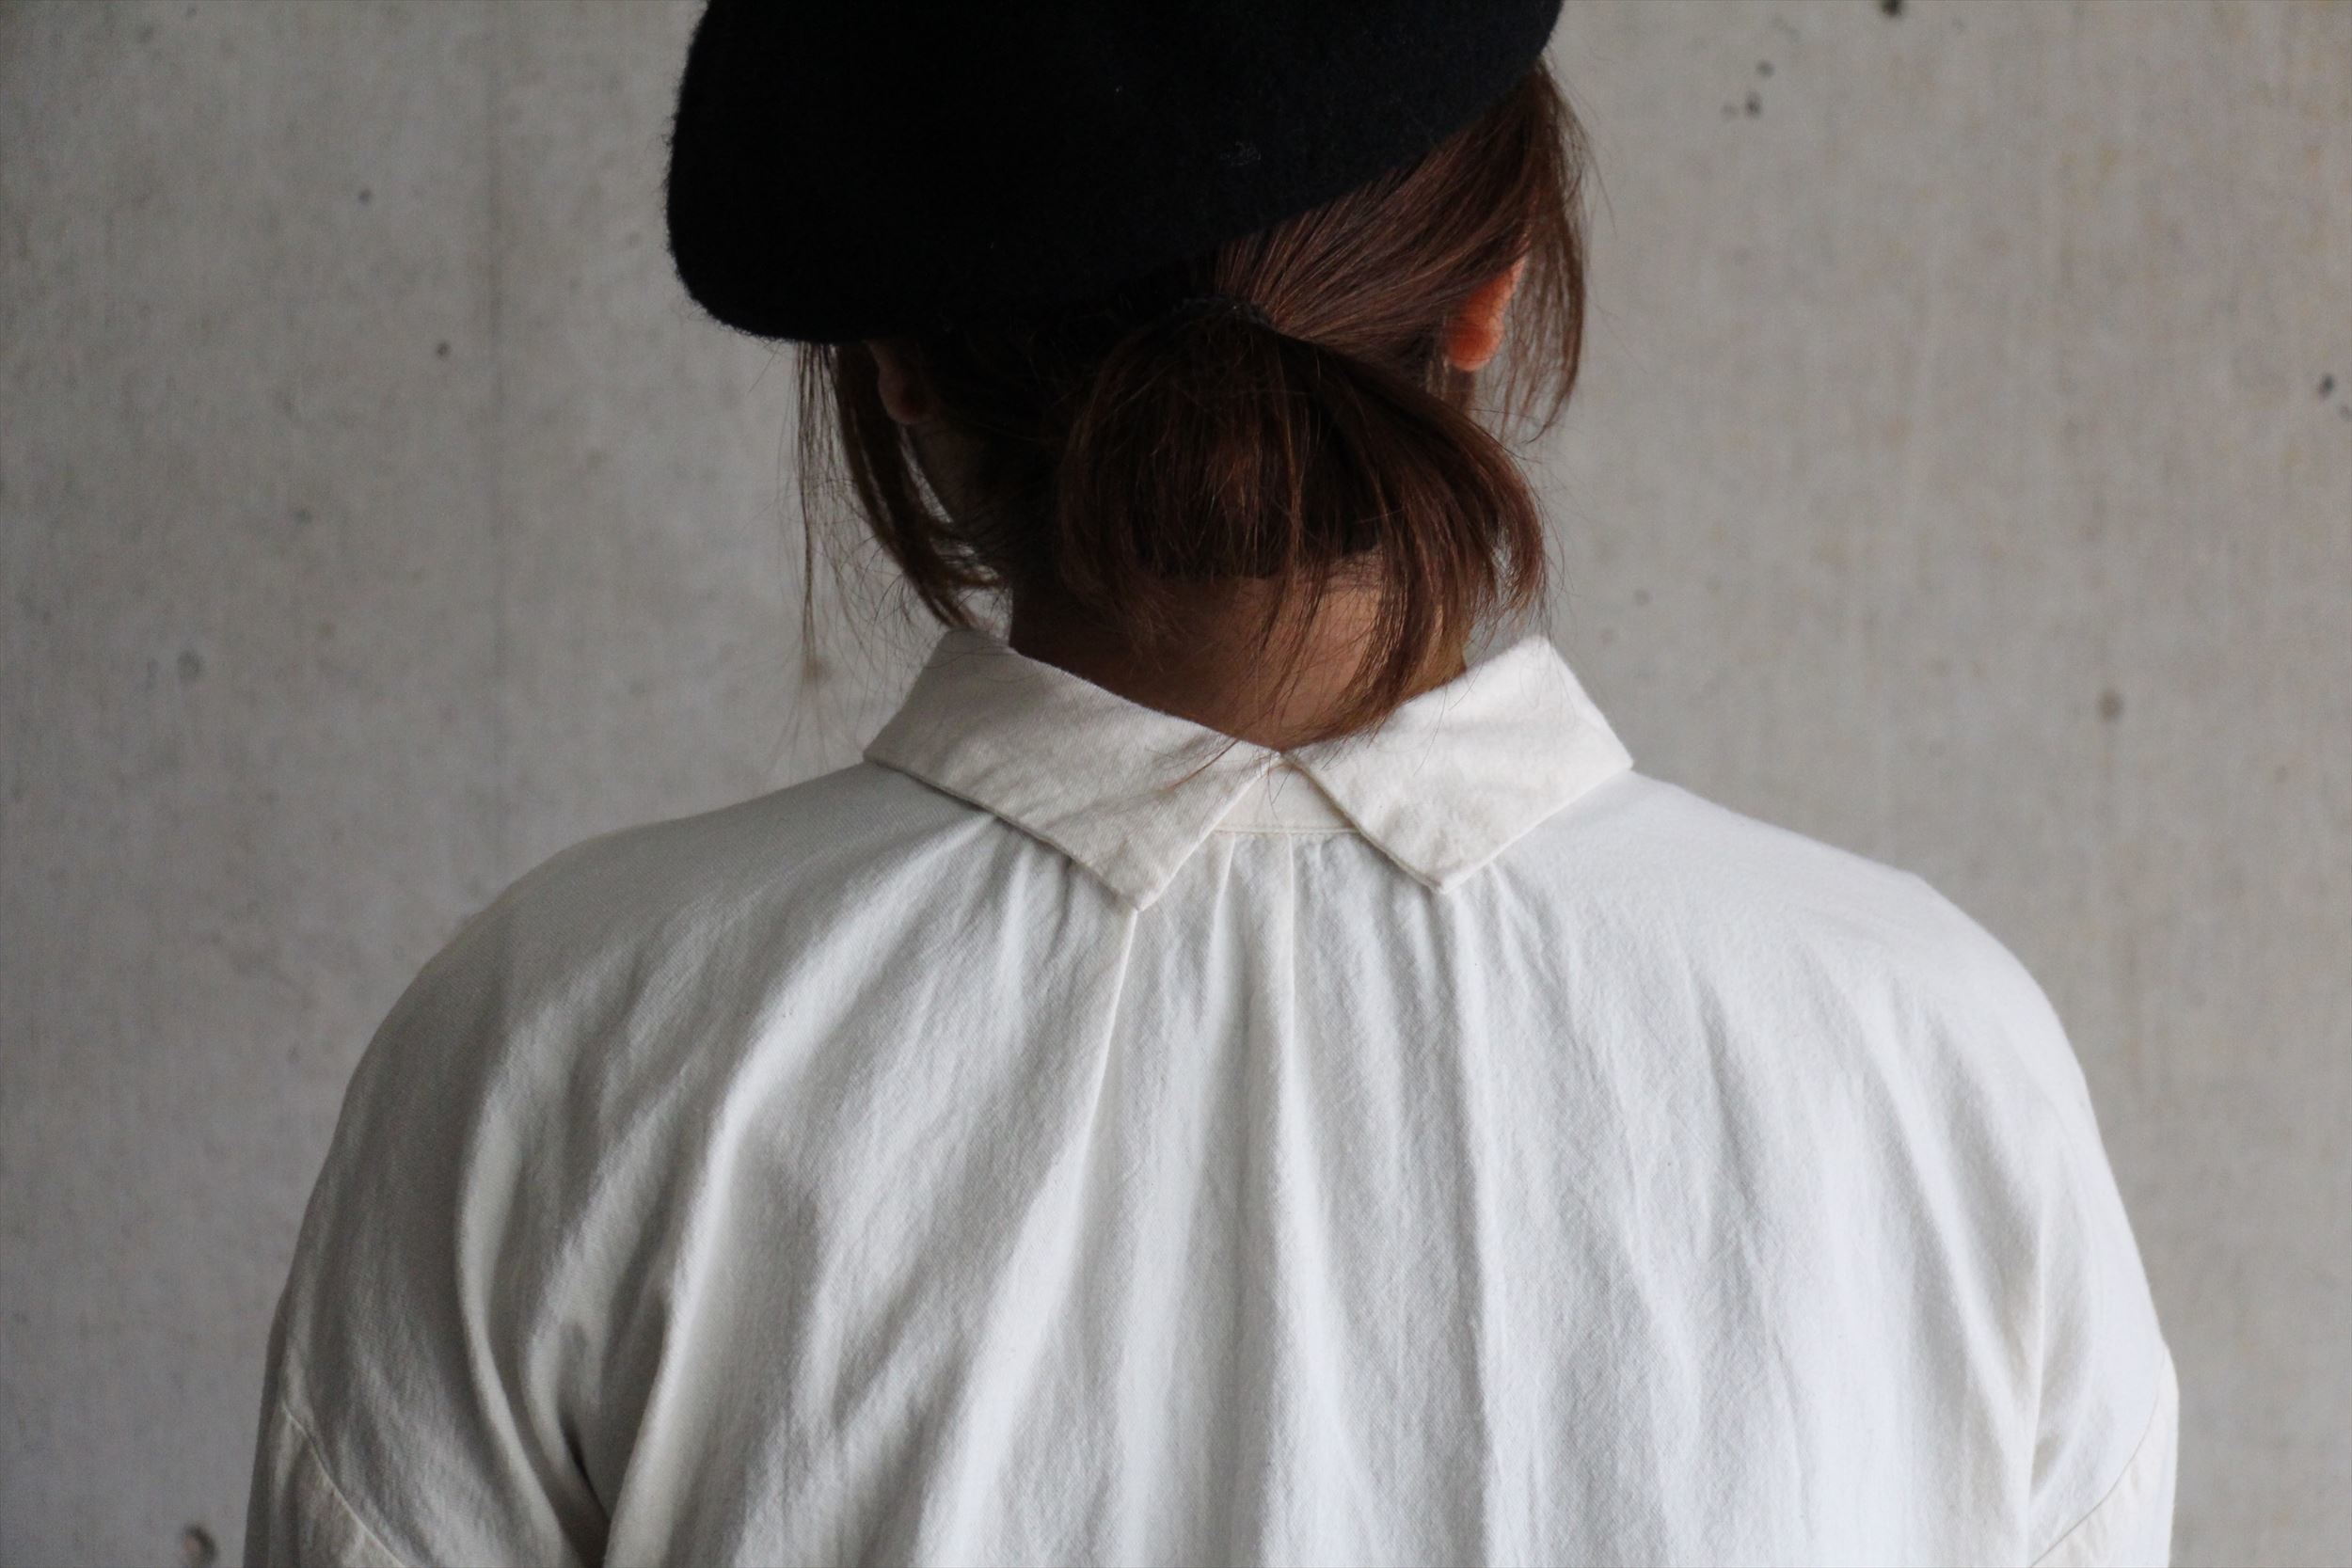 2wayボタンシャツ、ロングスカート_b0165512_17251652.jpg